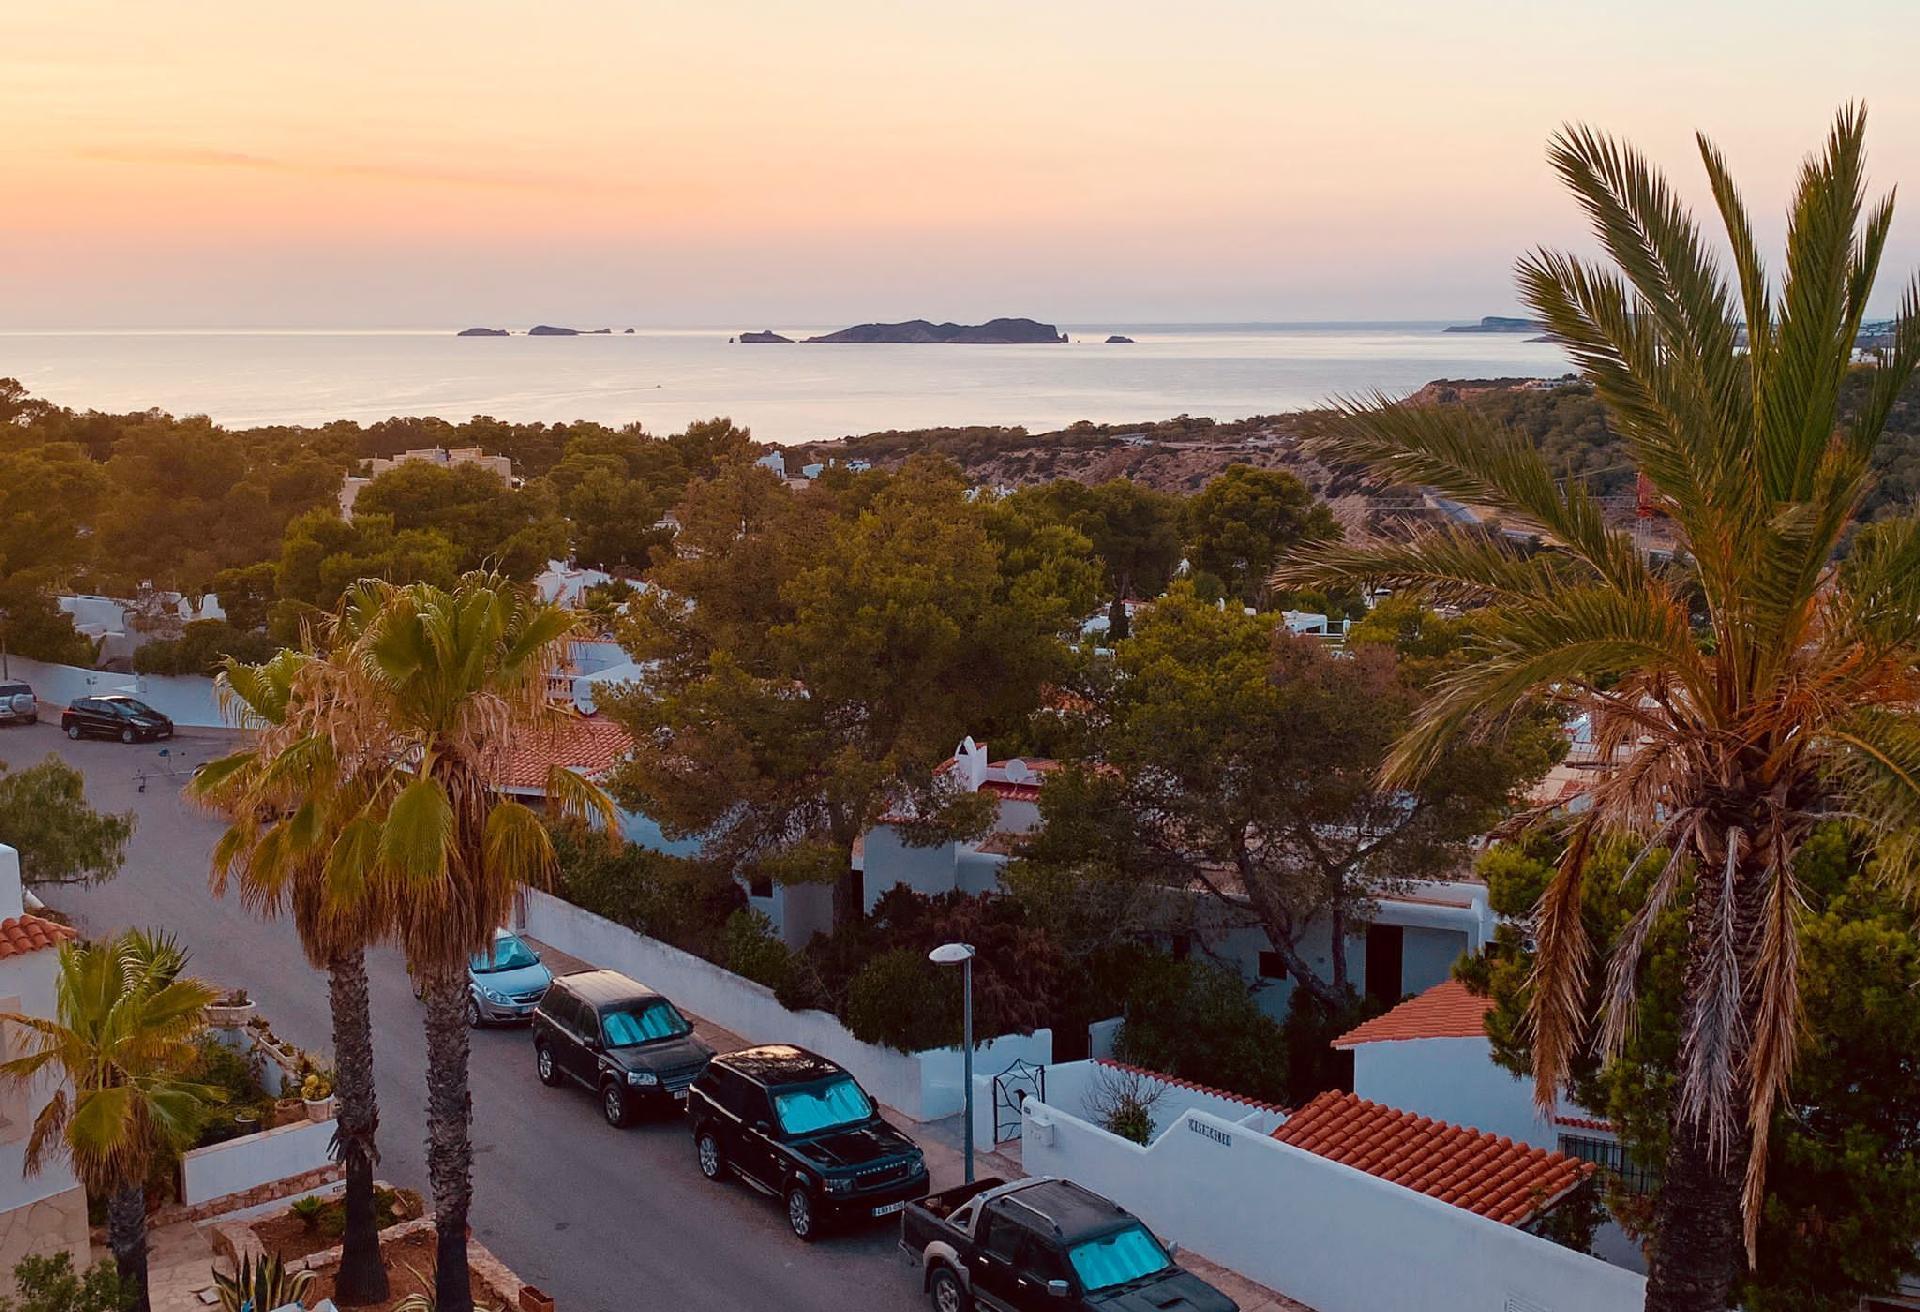 Ferienwohnung für 2 Personen ca 45 m² in Sant Josep de sa Talaia Ibiza Binnenland von Ibiza